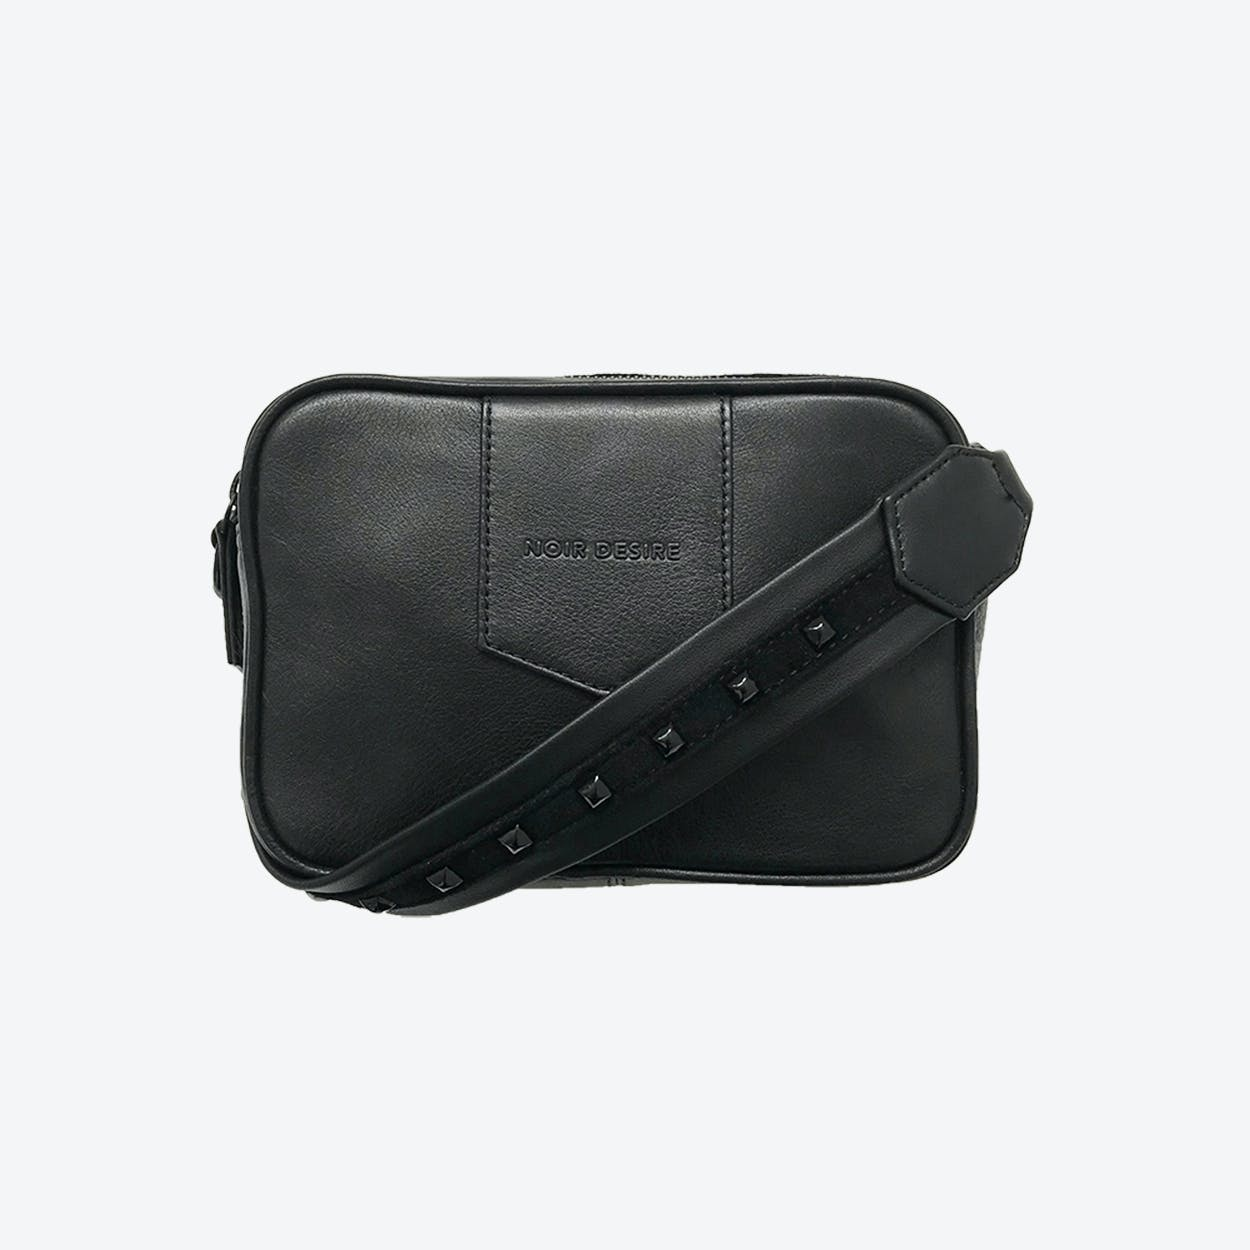 ND Lunel Sort #3 - Crossbody Leather Bag